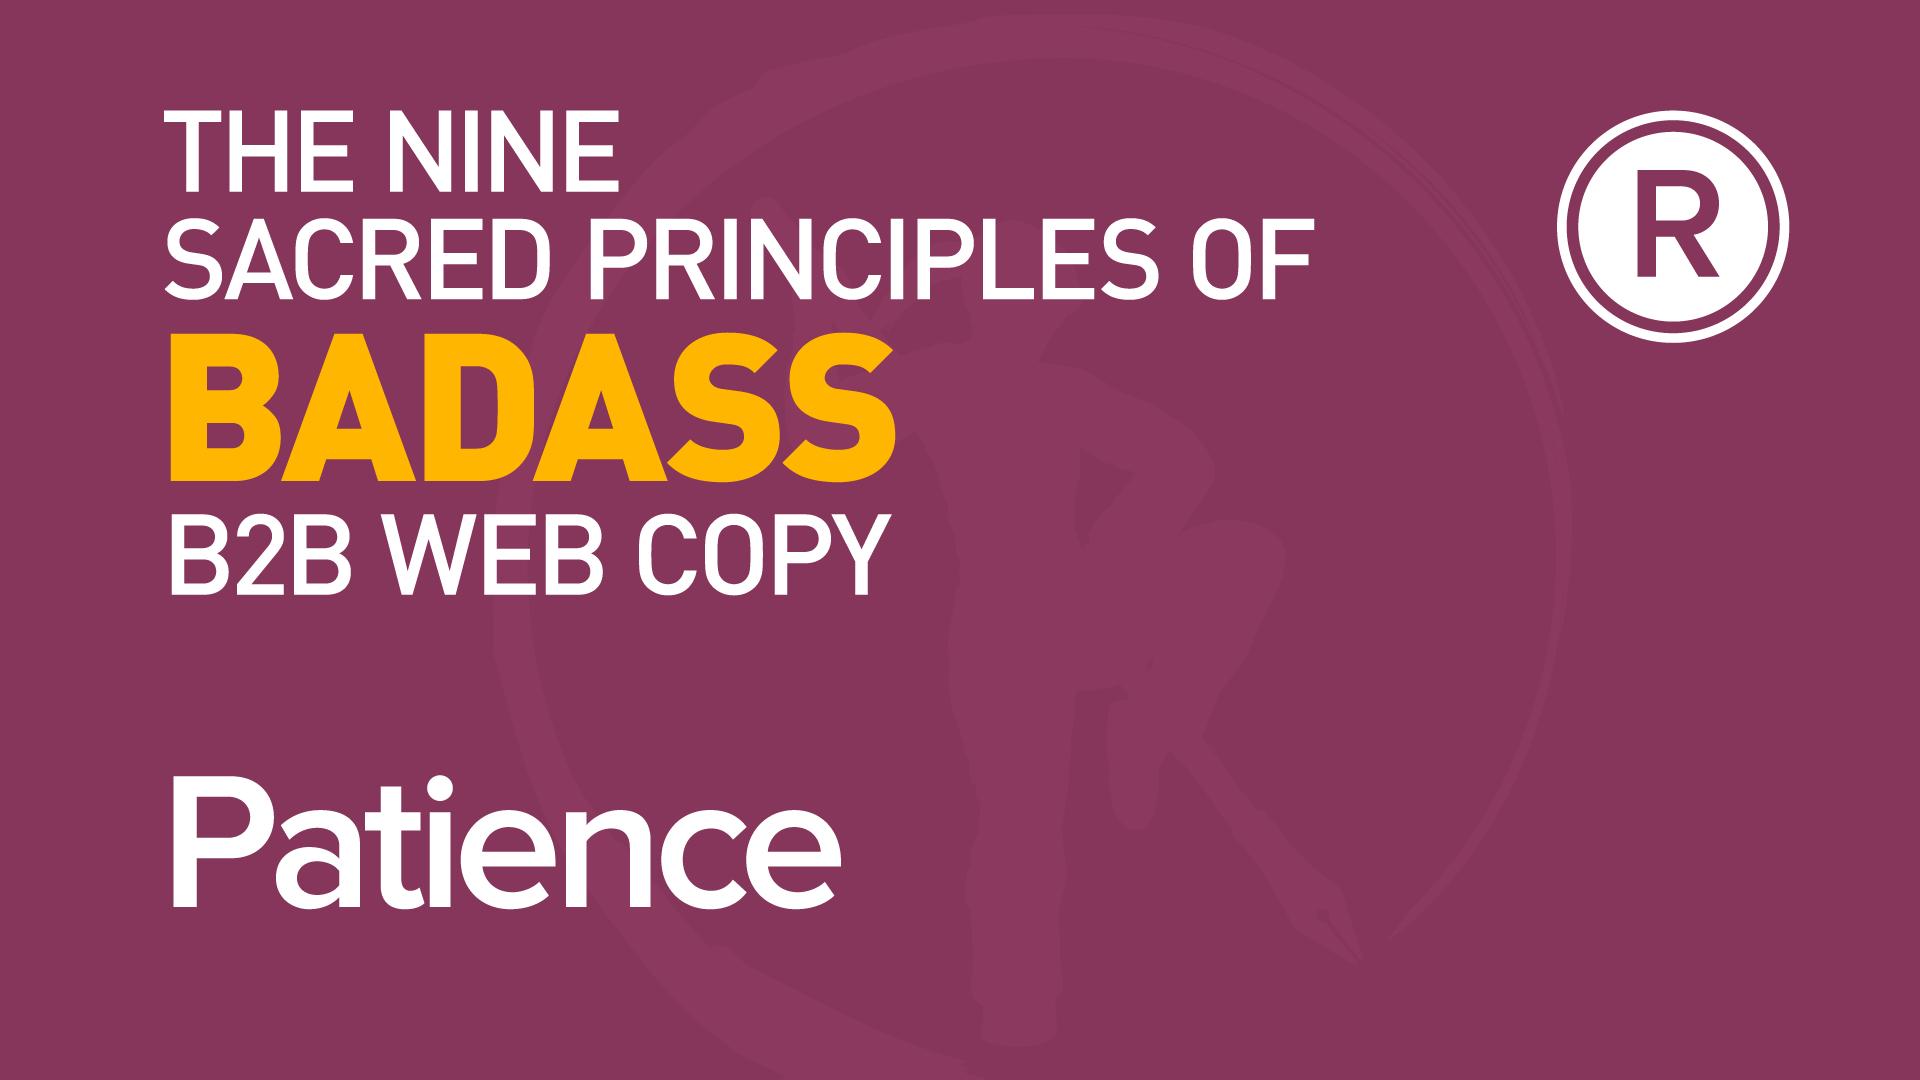 9th principle of badass B2B web copy: Patience